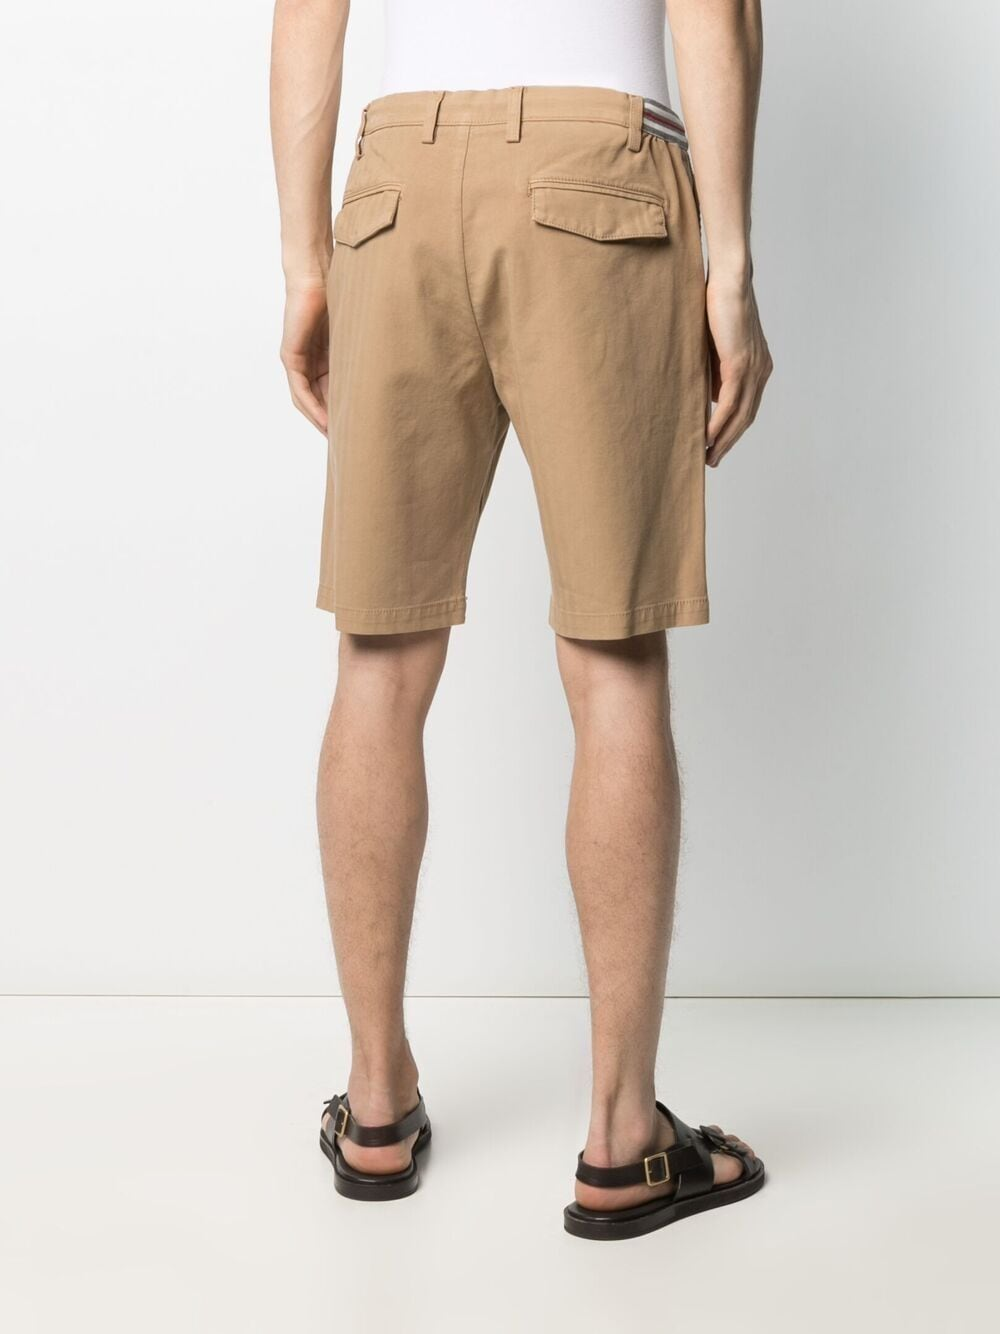 Pantaloncini con coulisse in cotone beige ELEVENTY | Bermuda | C70BERC01-TET0C02804